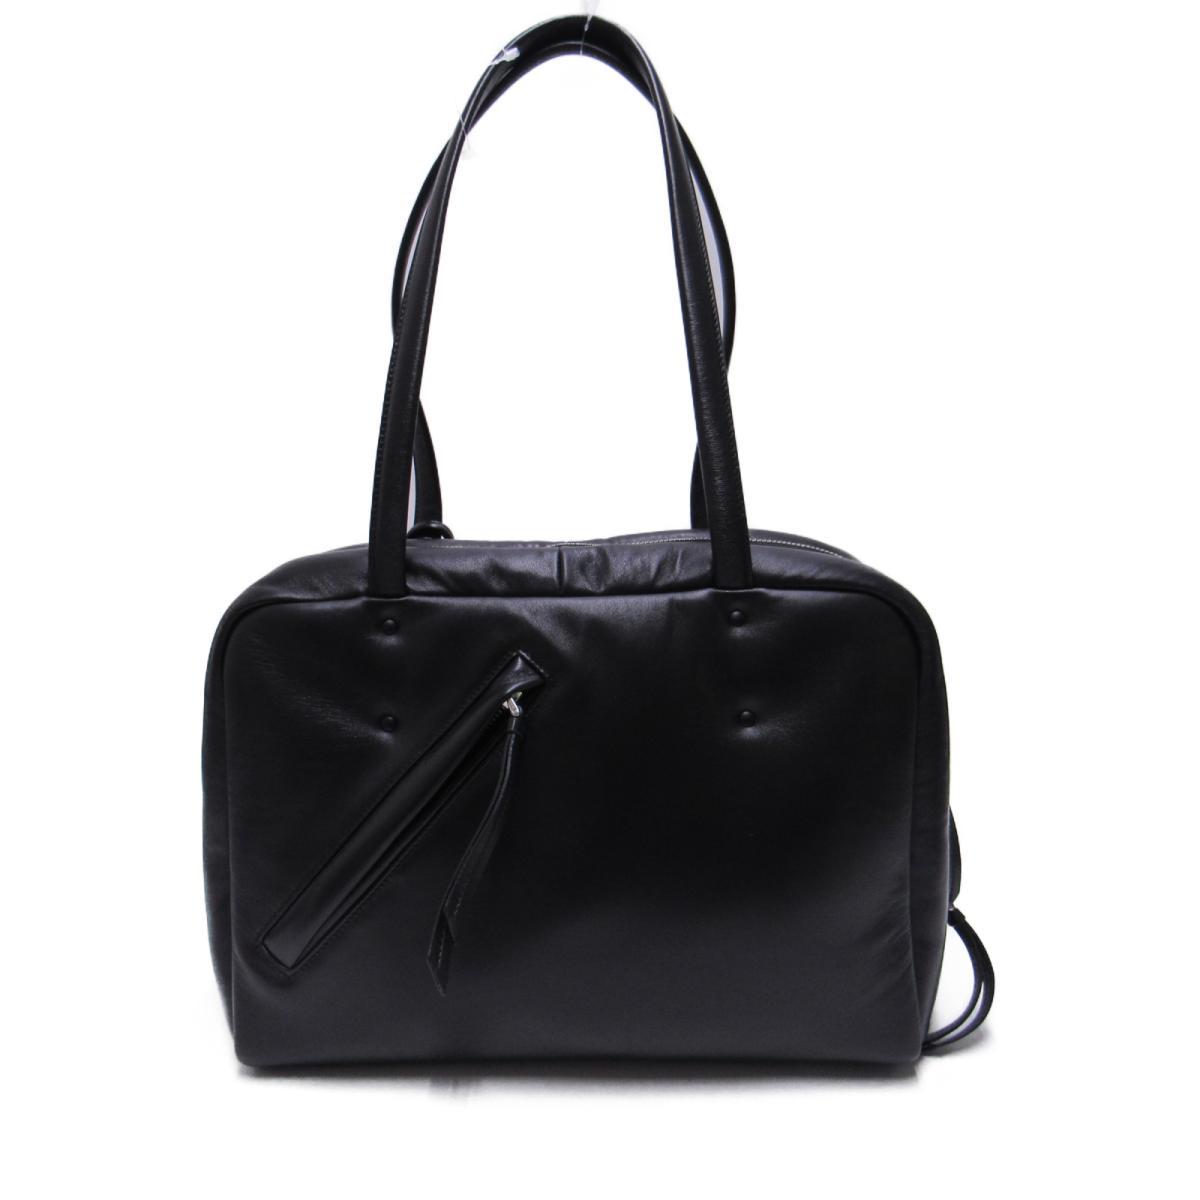 b3af7f70a27f45 ... Auth PRADA Padded Nappa Shoulder tote bag 1BB052 Padd Nappa leather  Black | BRANDOFF Ginza/ ...